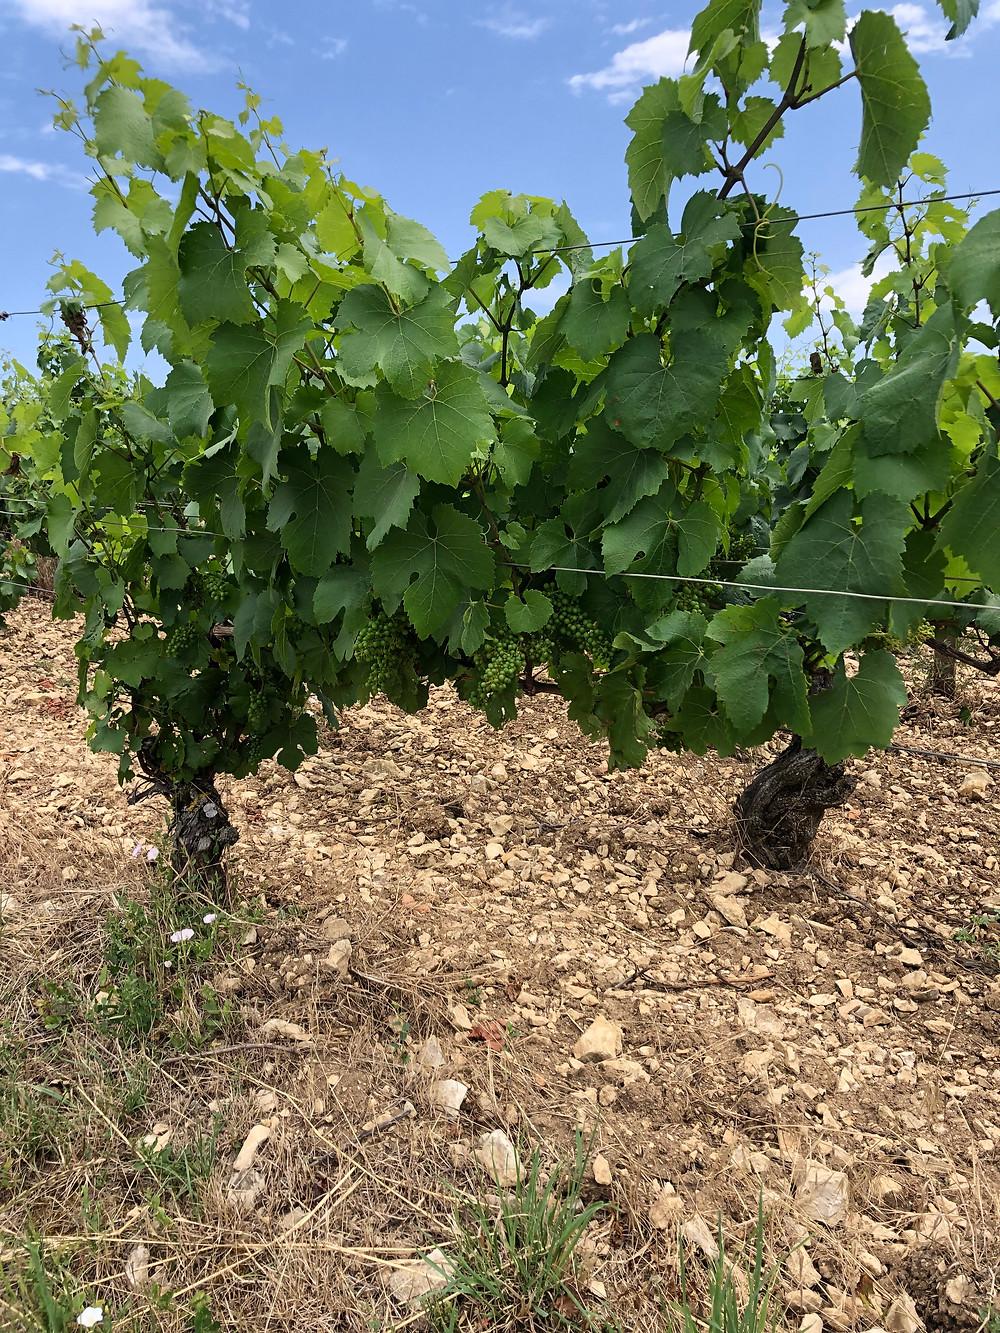 Marl and limestone soils of Chablis Grand Cru Le Clos vineyard in Burgundy France